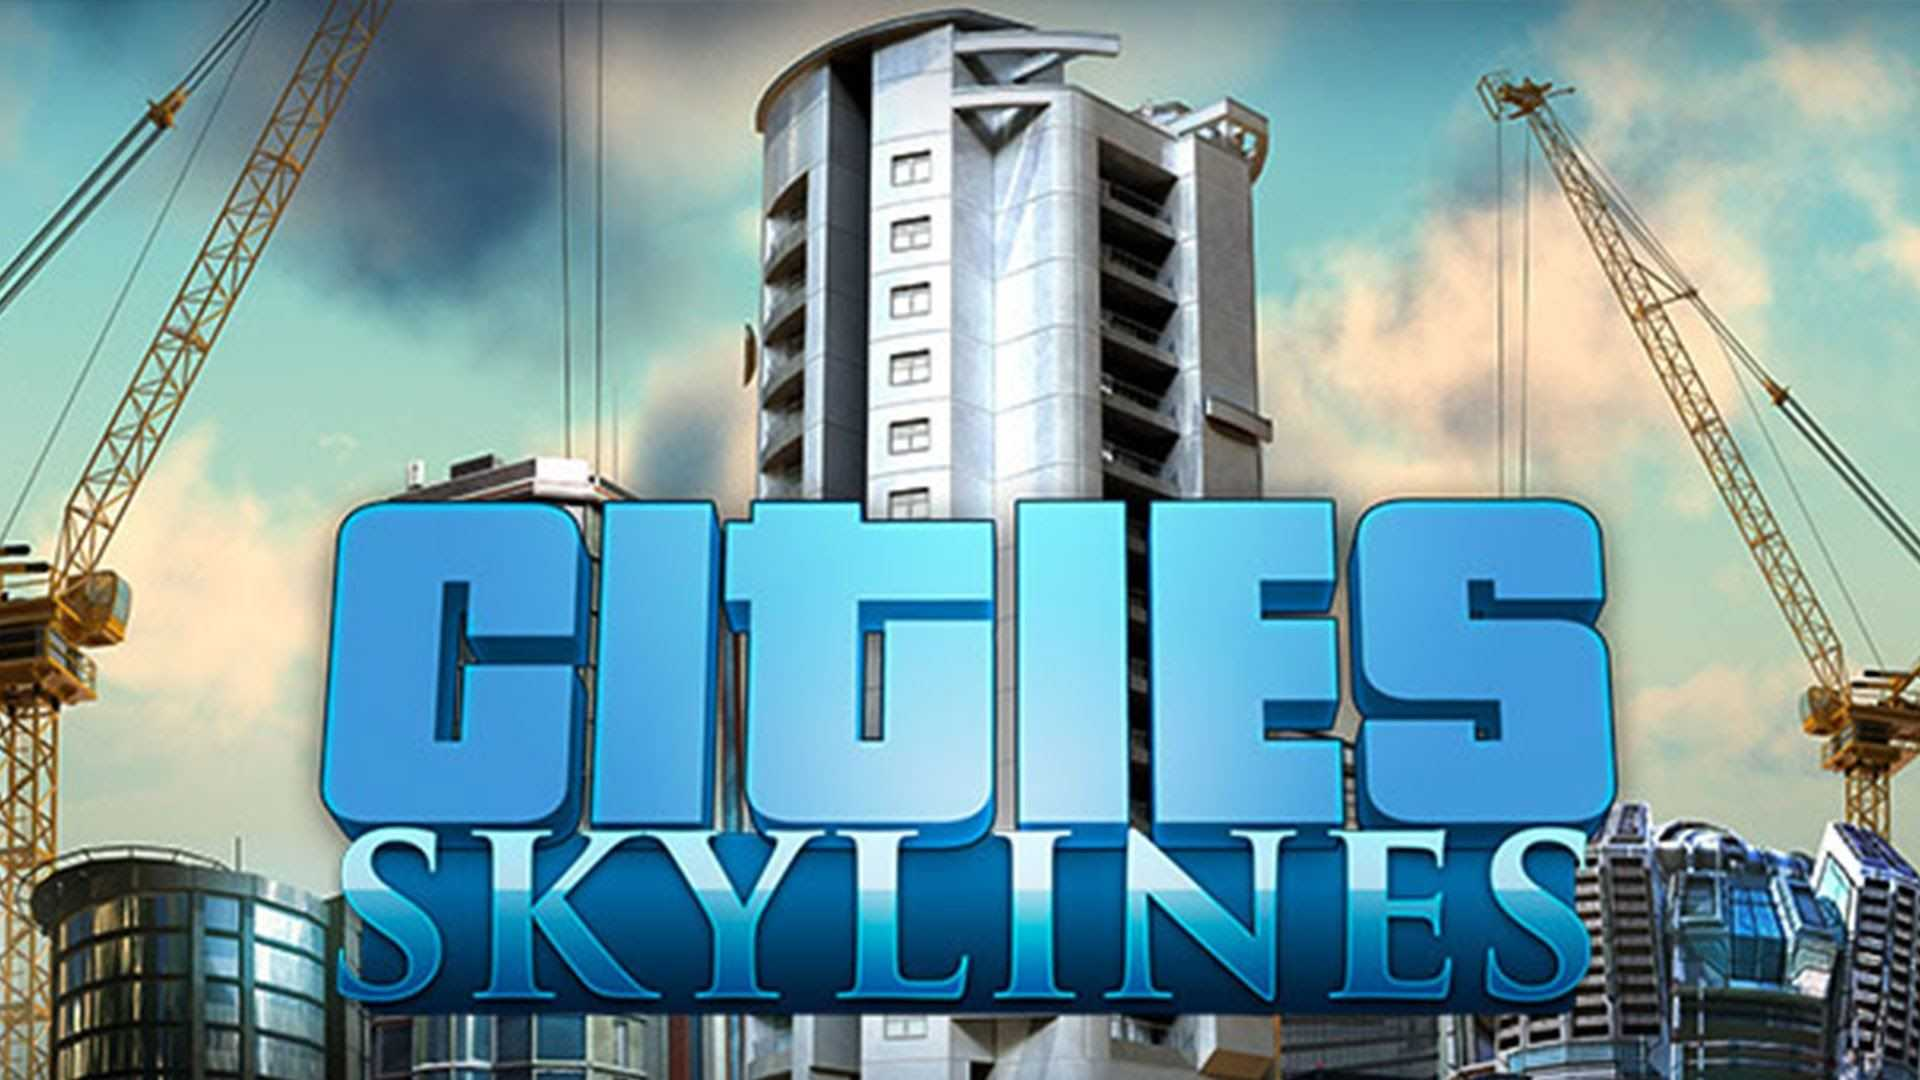 cities-hd-free